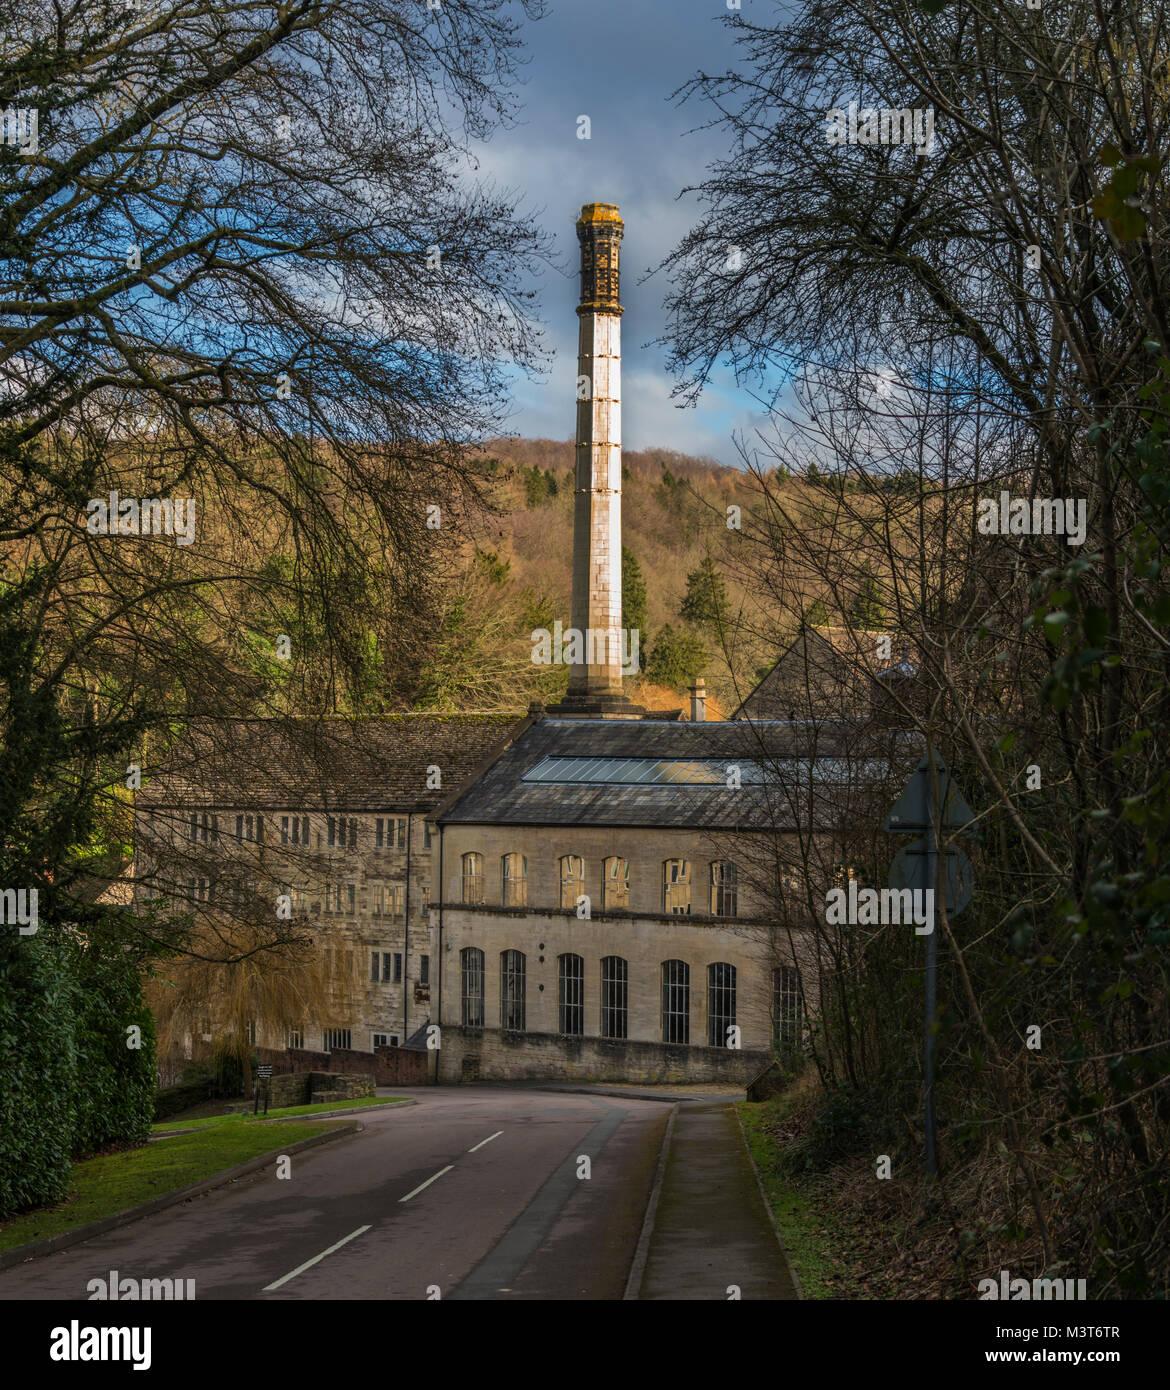 Longford Mills, Nailsworth, Gloucestershire, UK - Stock Image